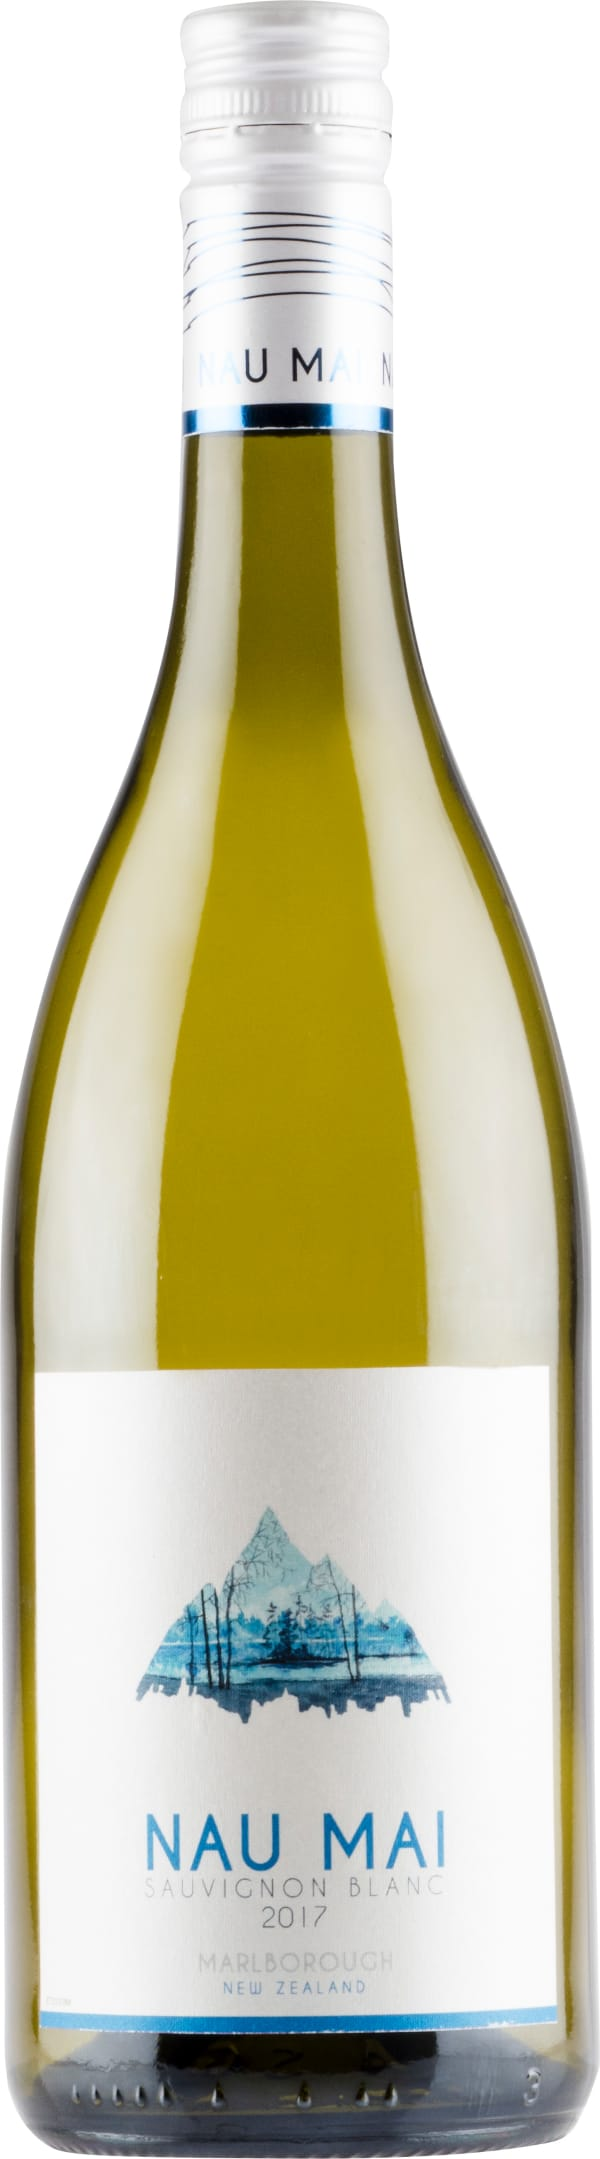 Nau Mai Sauvignon Blanc 2018